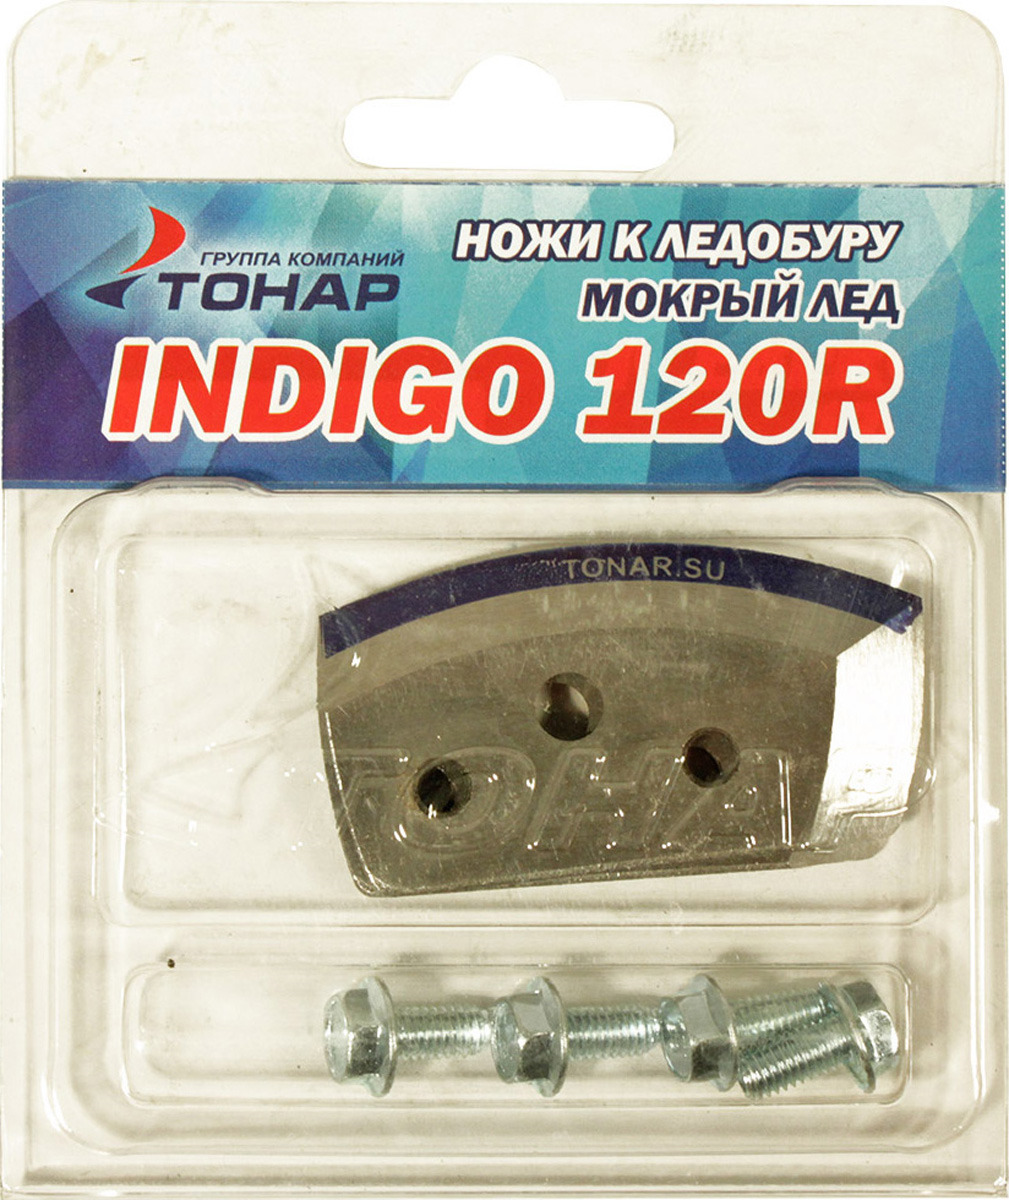 Ножи для ледобура ТОНАР Indigo-120R Мокрый лед, 0066609, серый металлик, диаметр 12 см комплект крепежа ледобура тонар 0017352